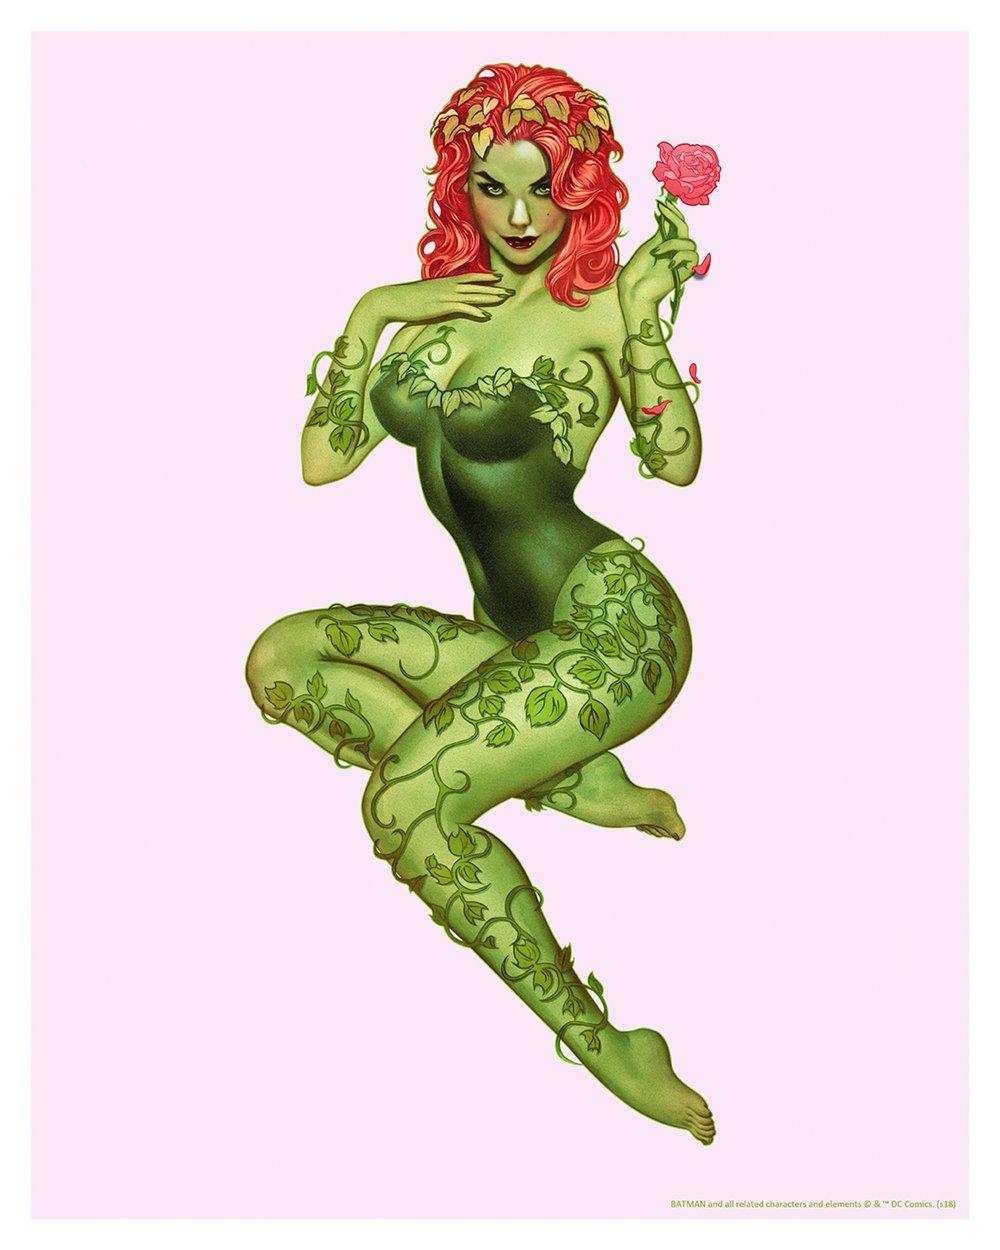 Keaveney-Poison-Ivy-GreenEnvy.jpg